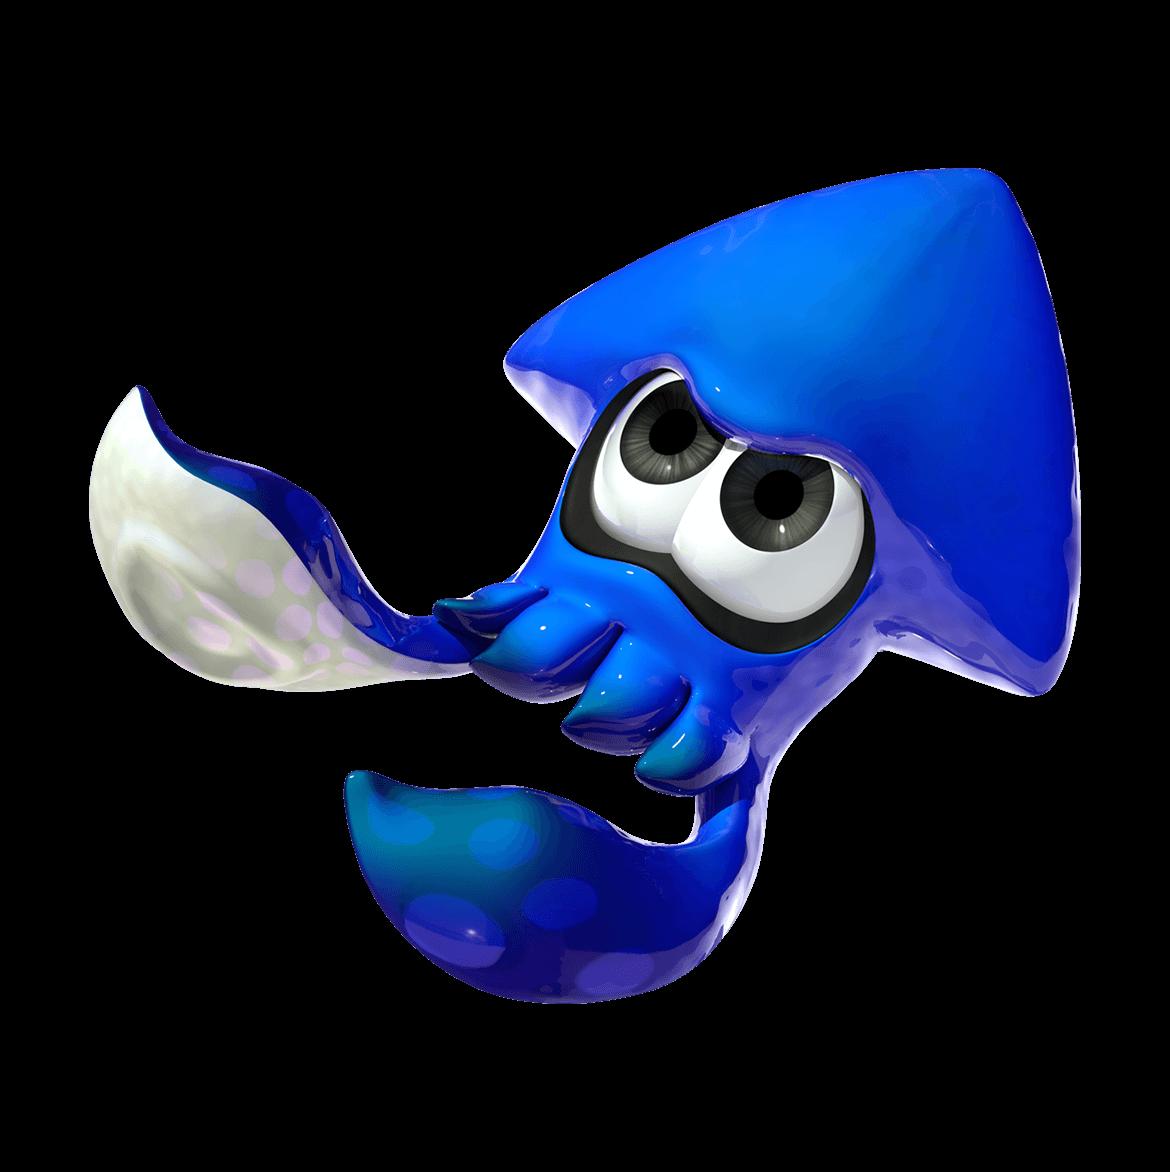 Pin Splatoon Squid 1170x1172